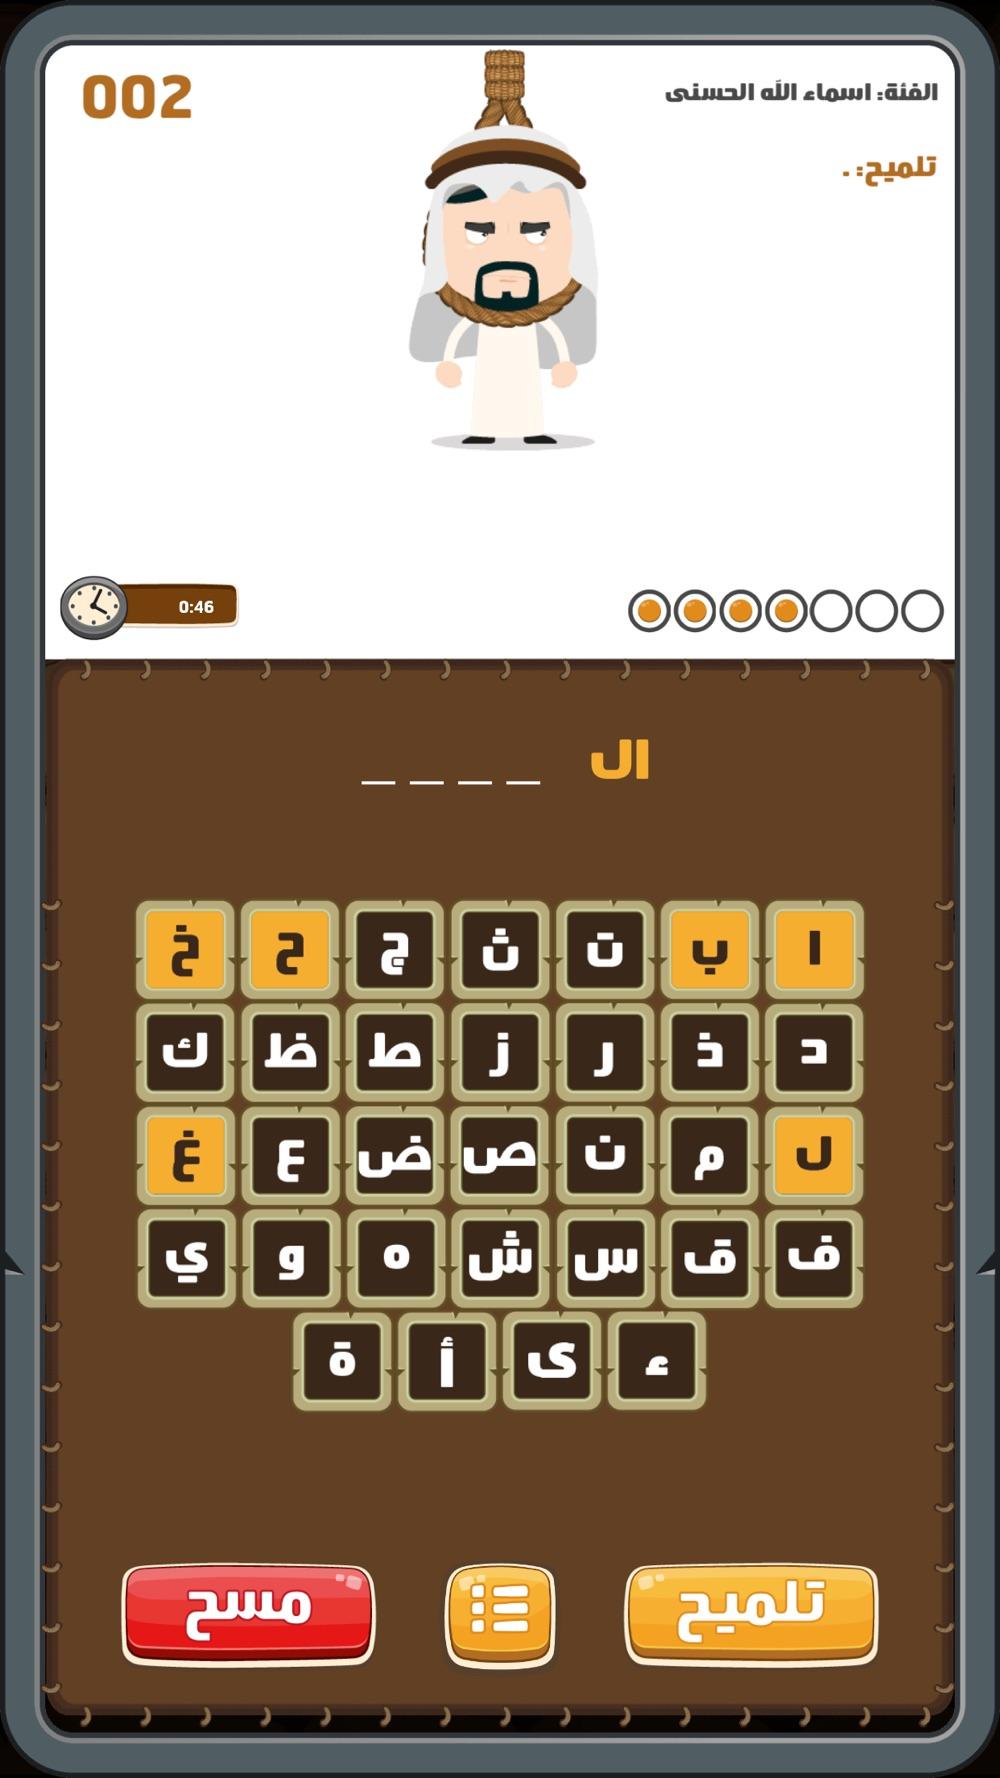 Arabic Hangman RSS | الرجل المشنوق hack tool